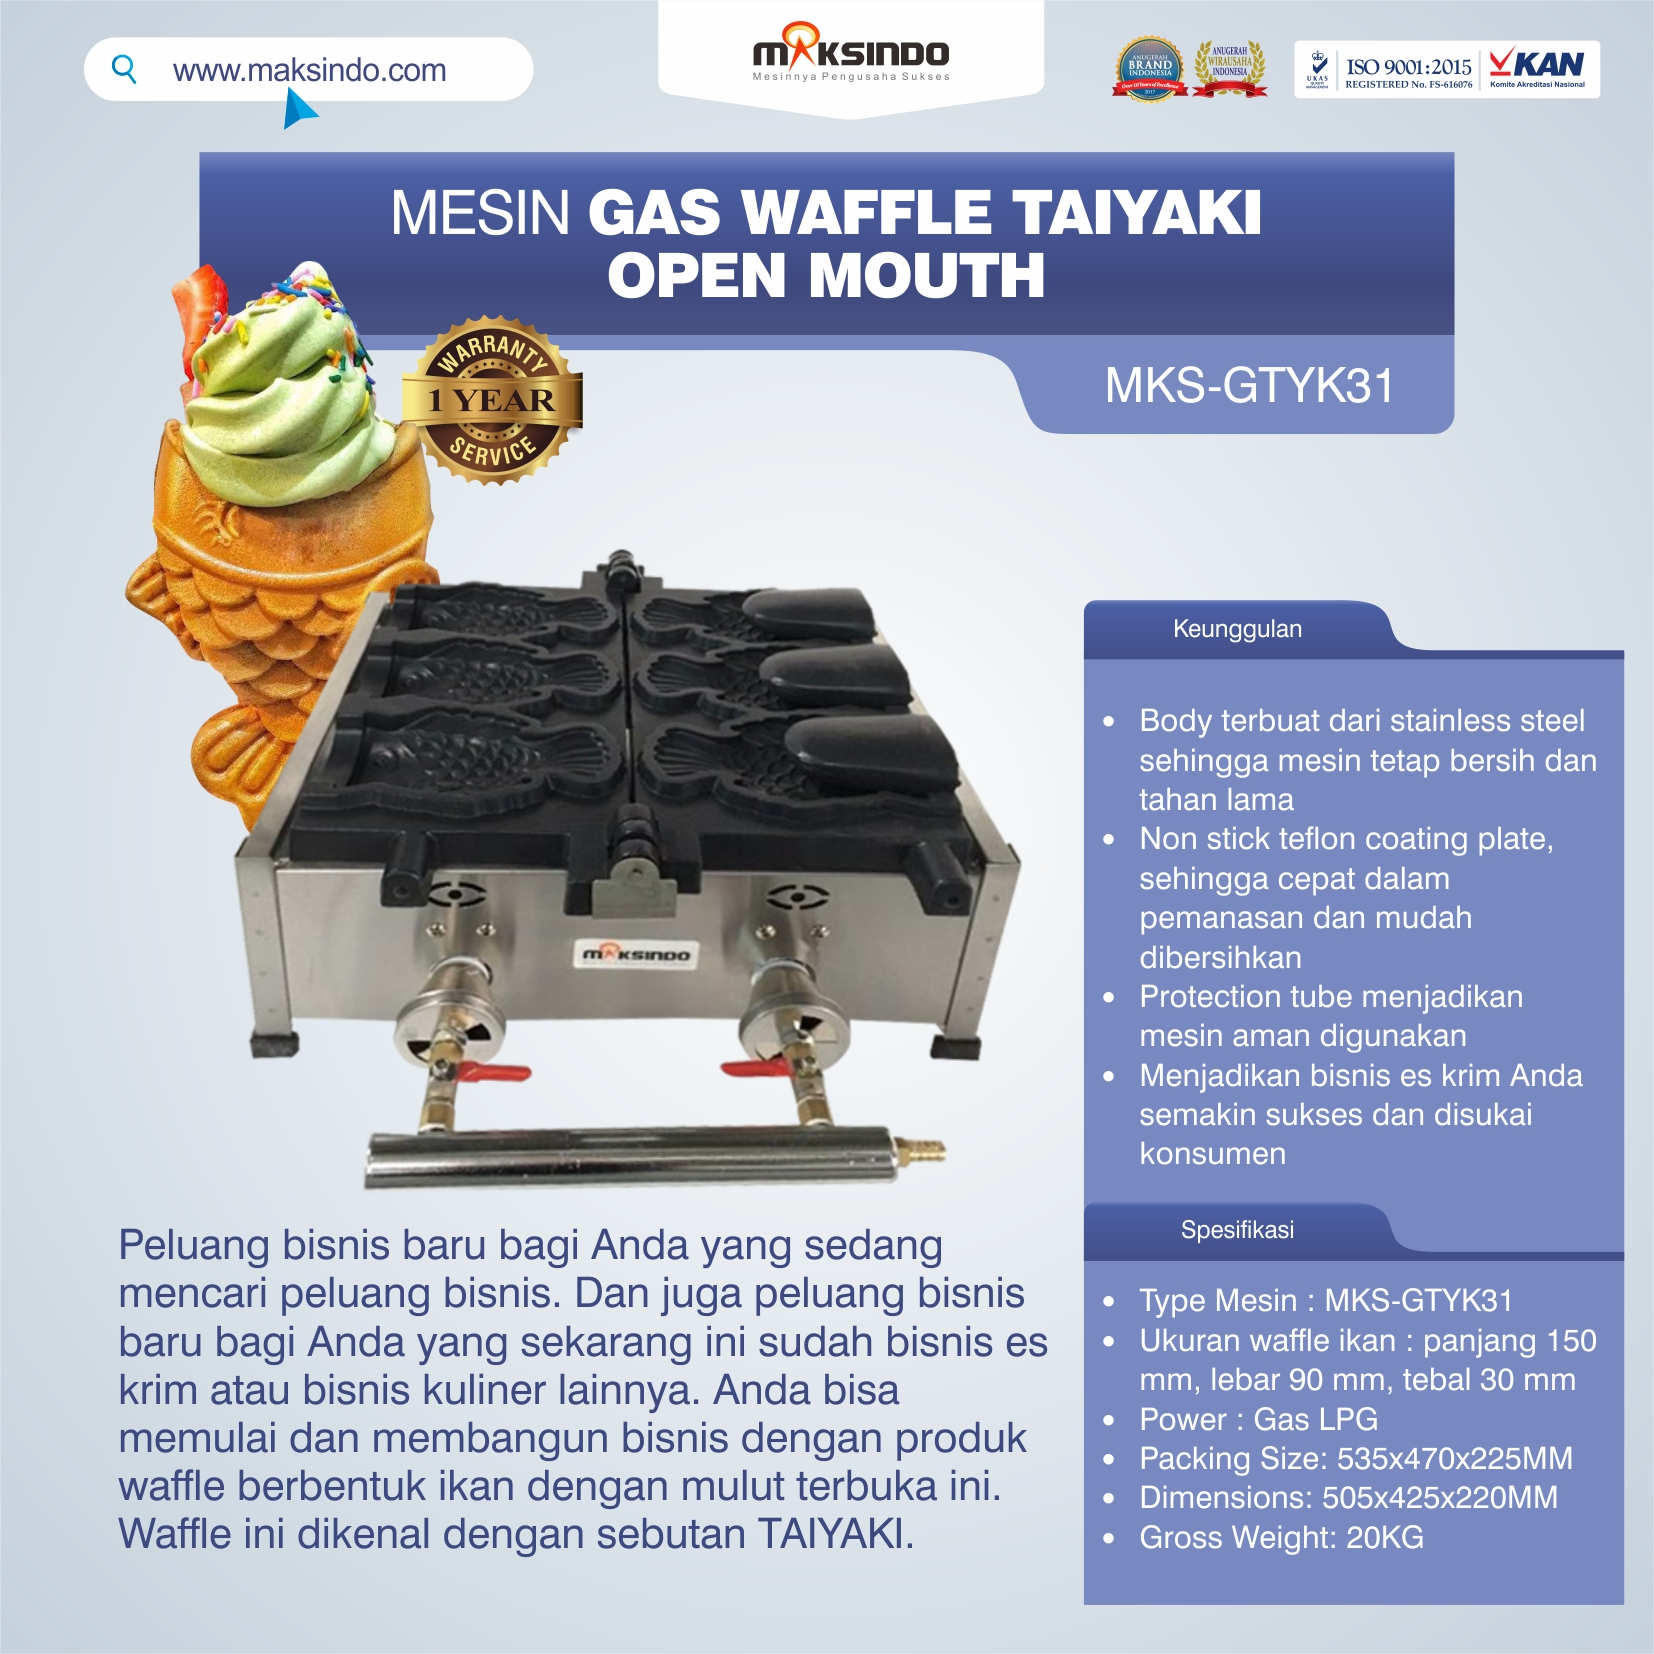 Mesin Gas Waffle Taiyaki Open Mouth (GTYK31)